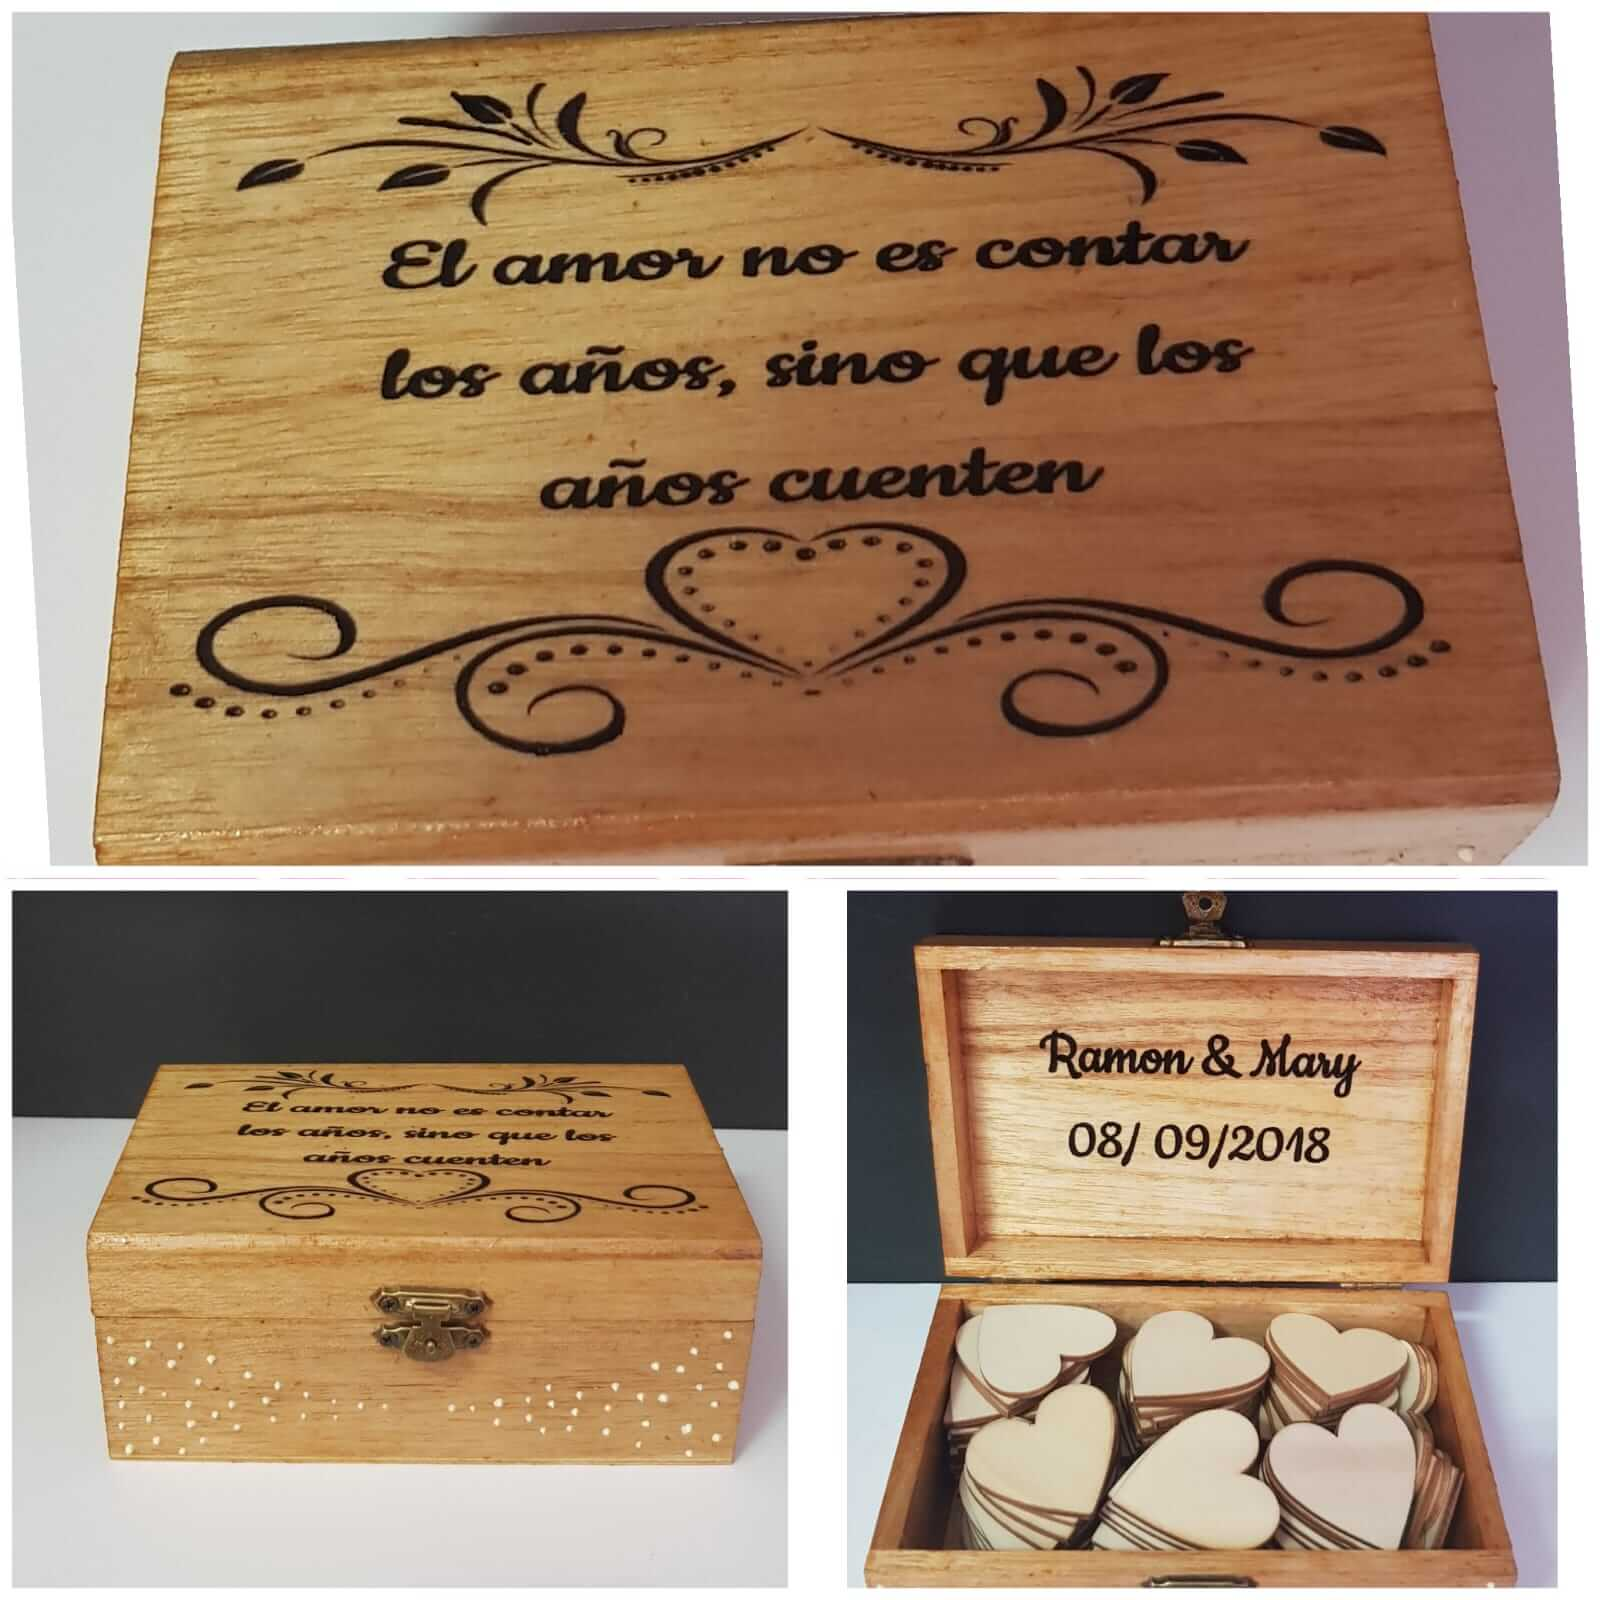 Caja de madera para libro de firmas caja de madera para libro de firmas - Caja de madera para libro de firmas 2 - Caja de madera para libro de firmas